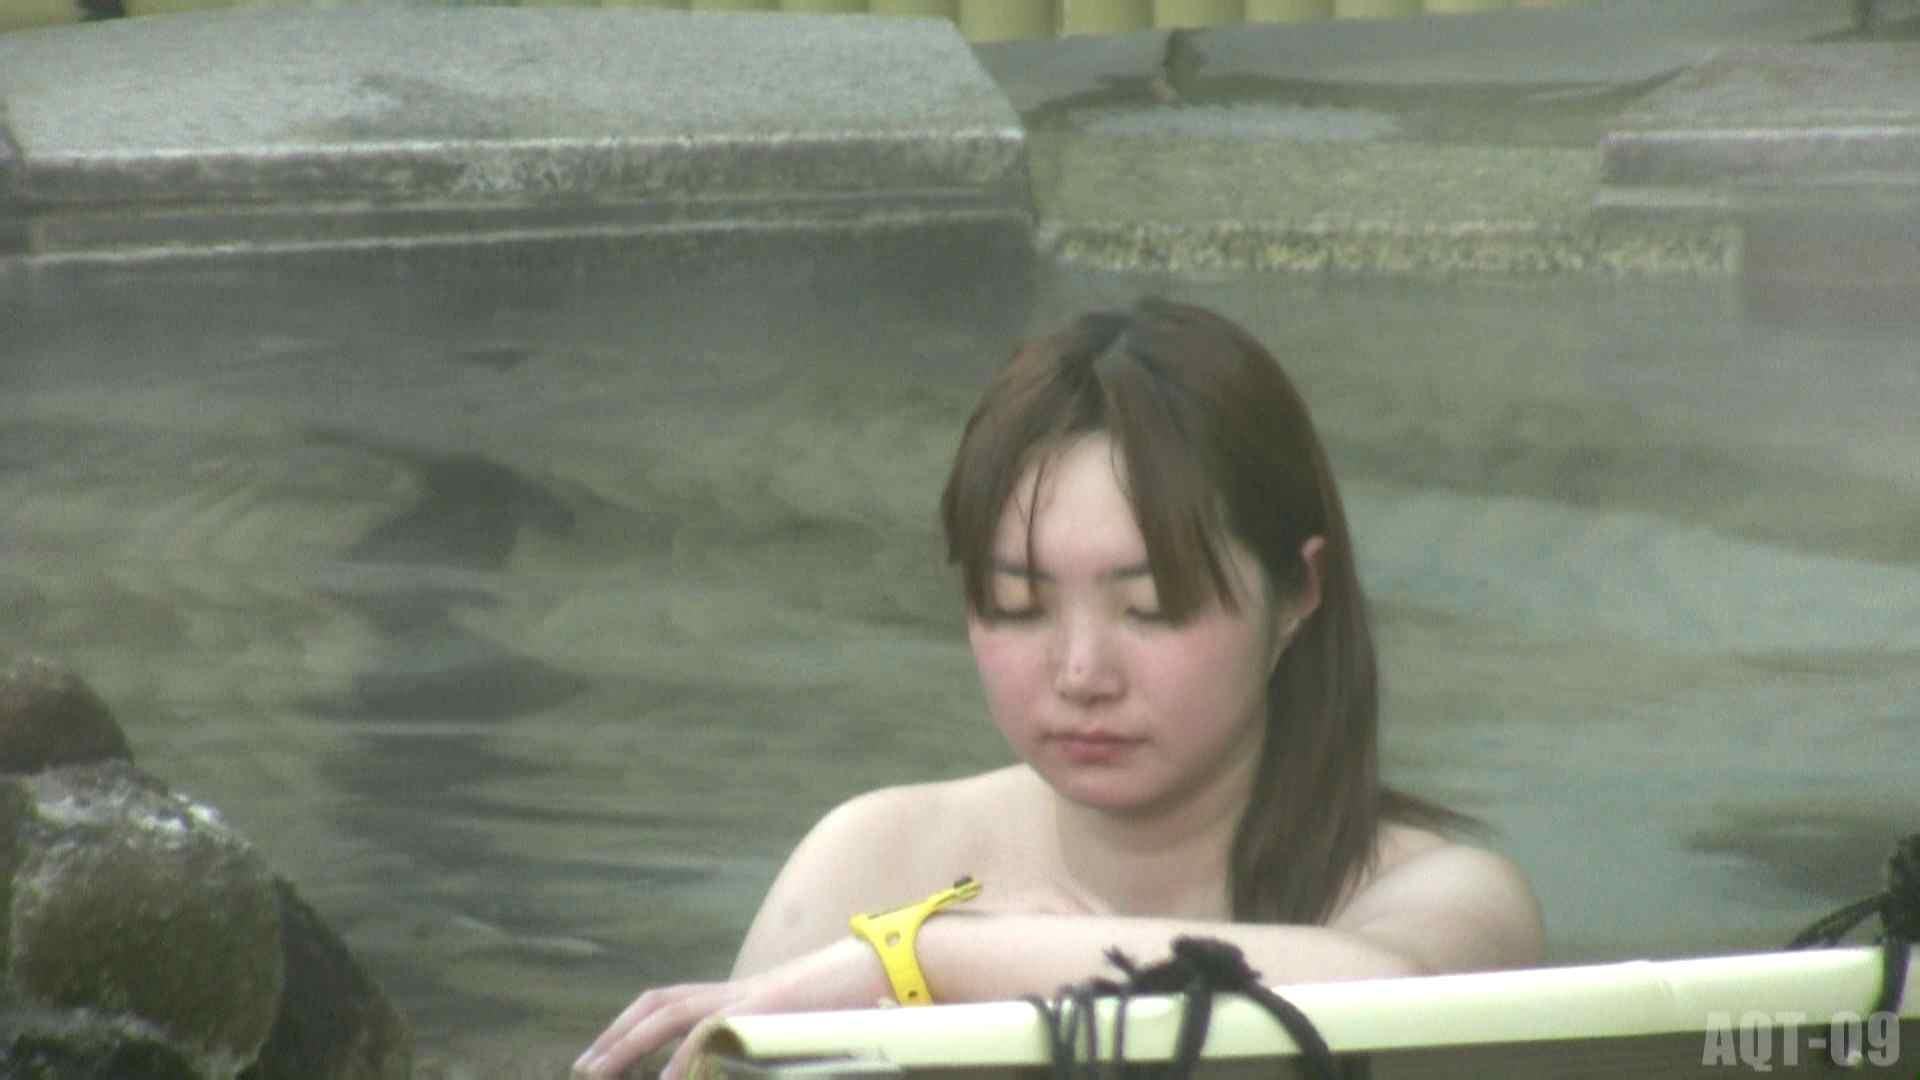 Aquaな露天風呂Vol.781 露天風呂   OLのエロ生活  93連発 76